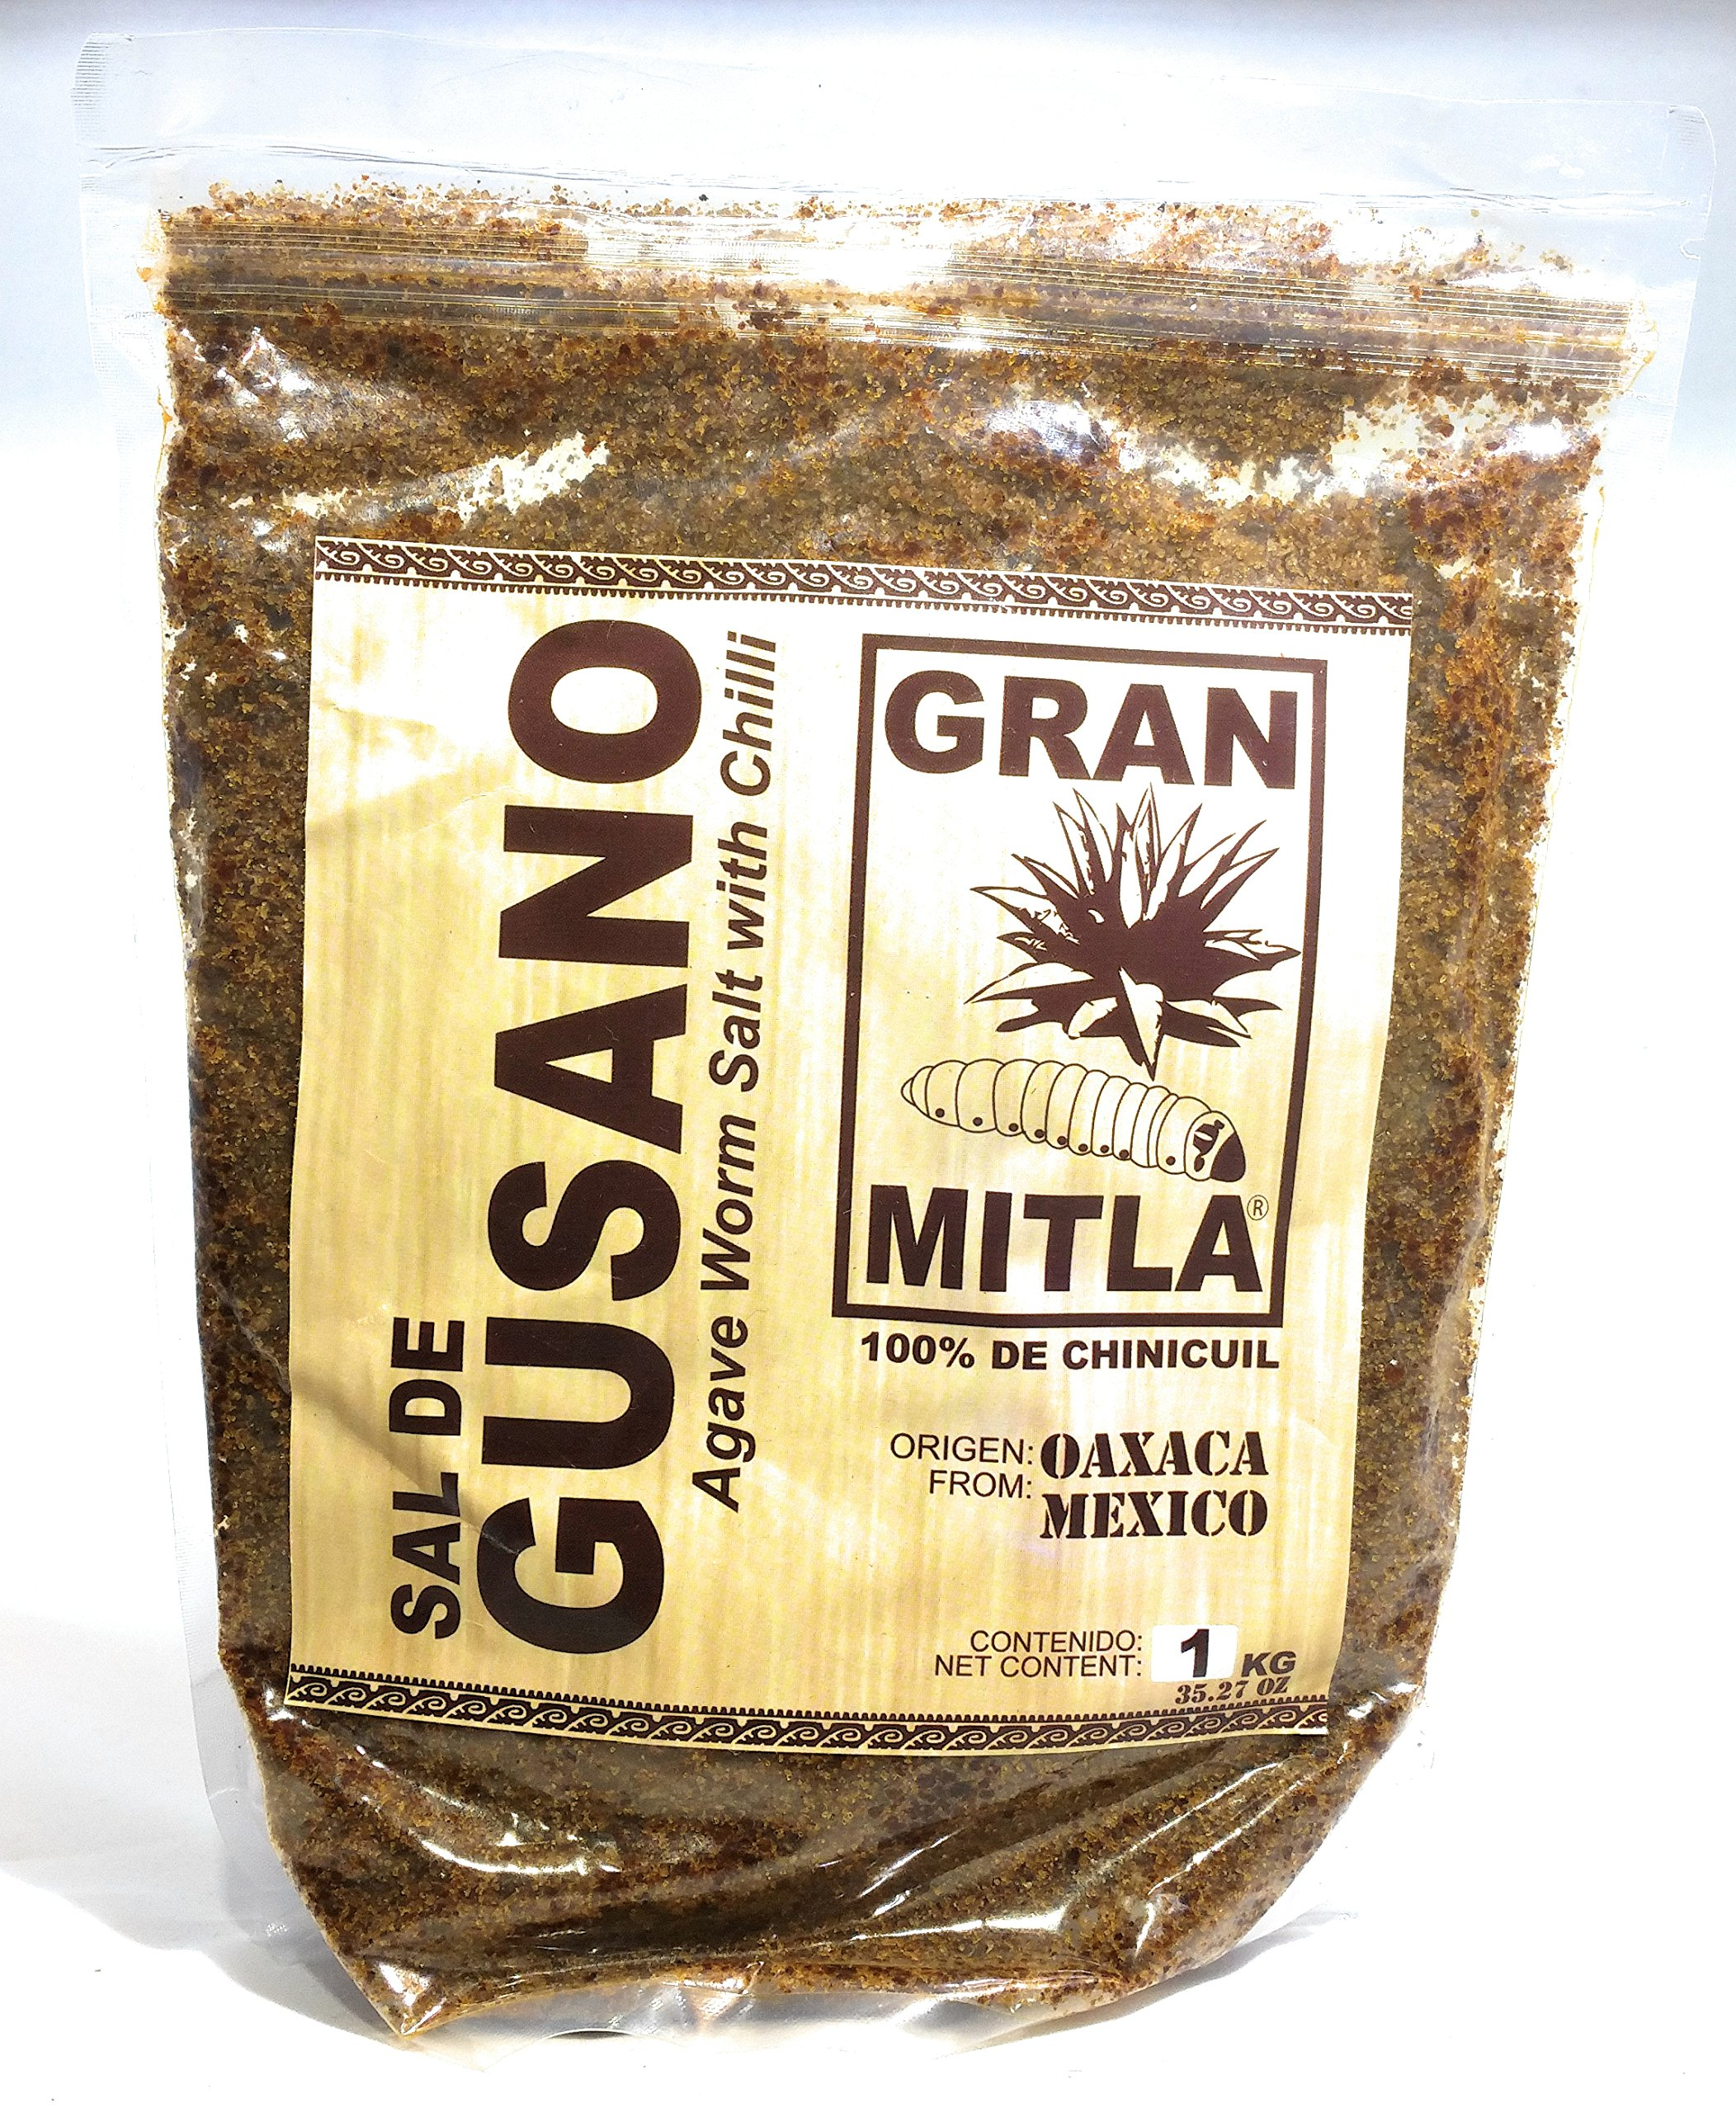 Gran Mitla Sal de Gusano 1 Kilogram Bag (2.20 Pounds)